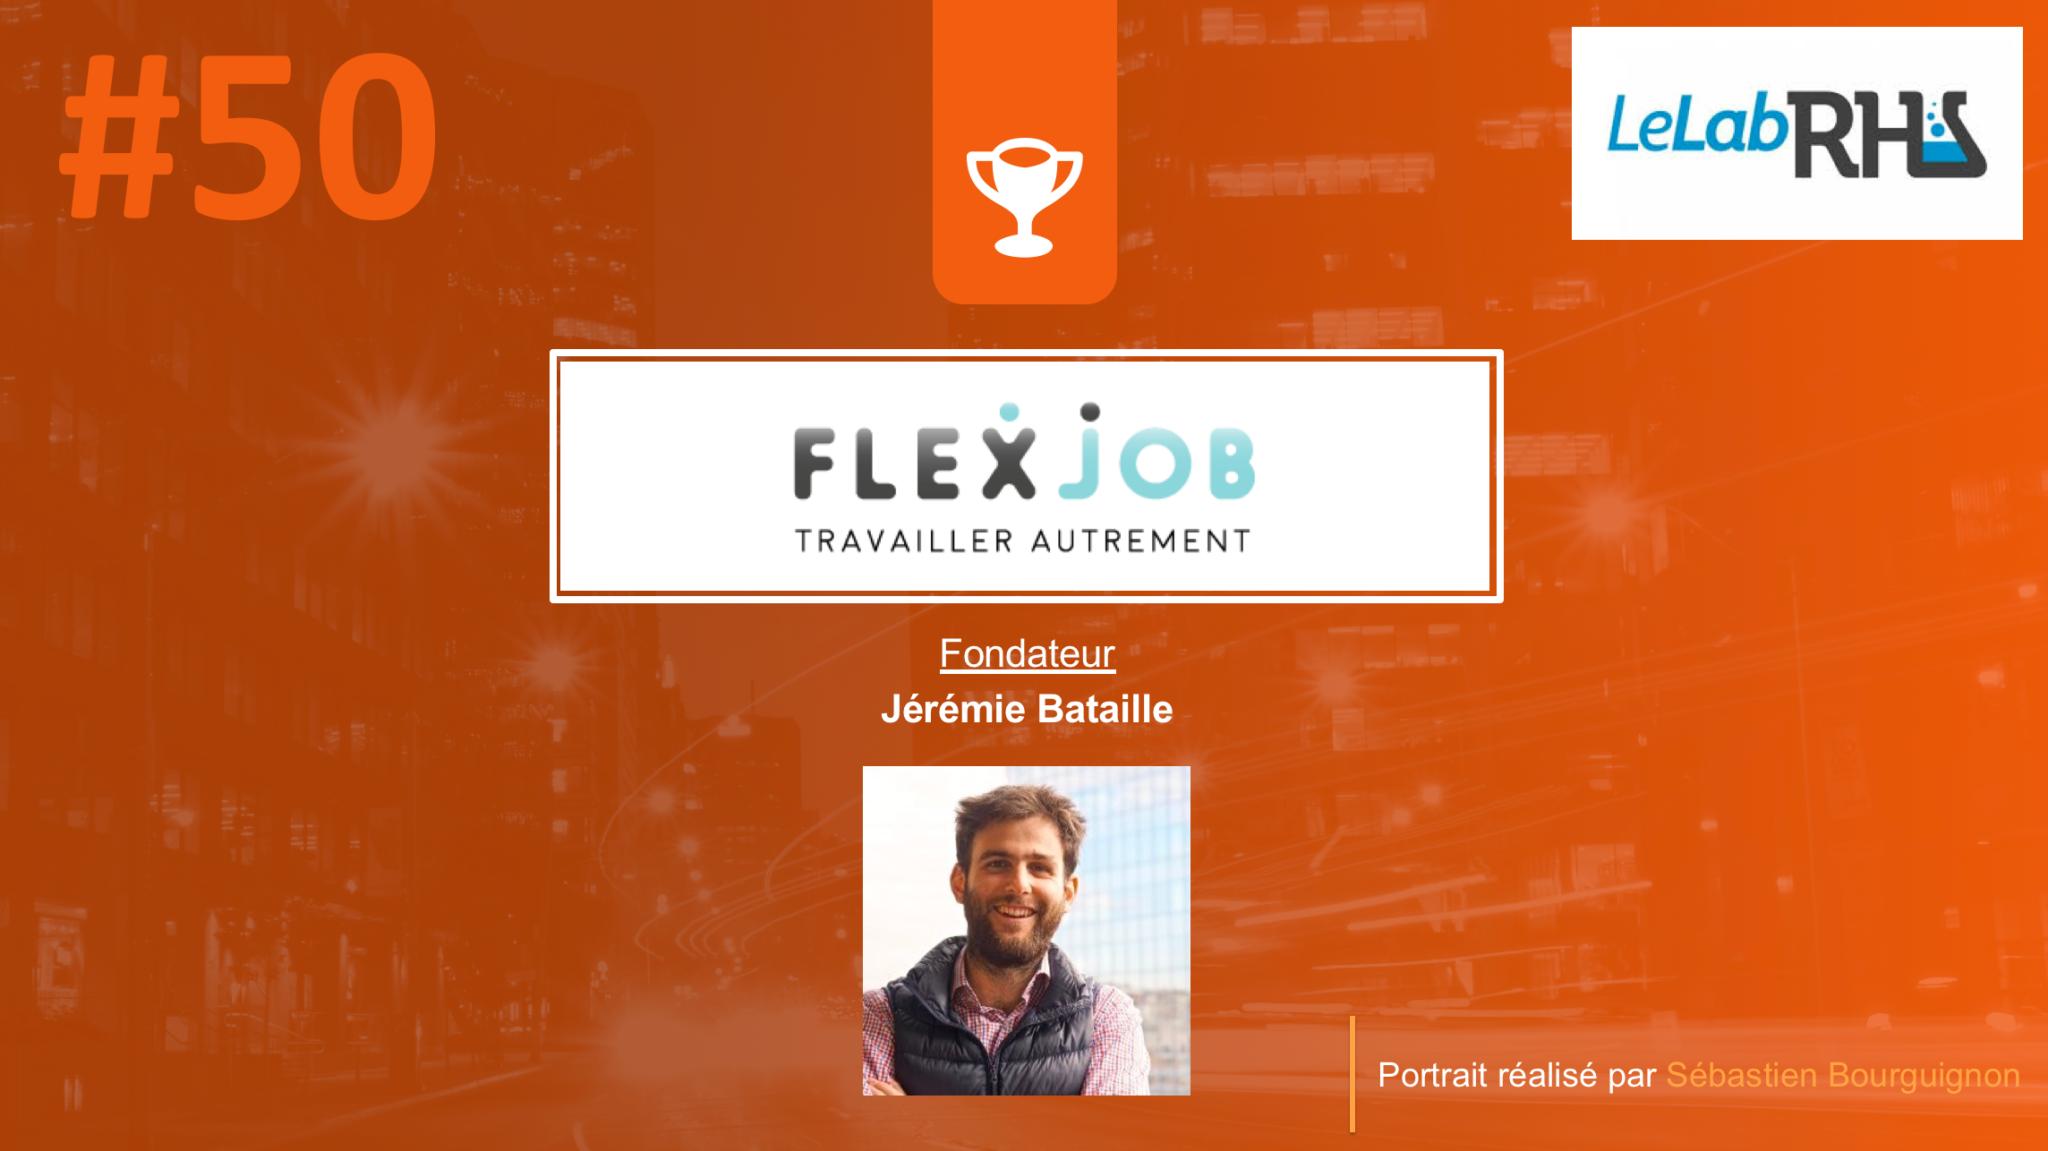 flexjob